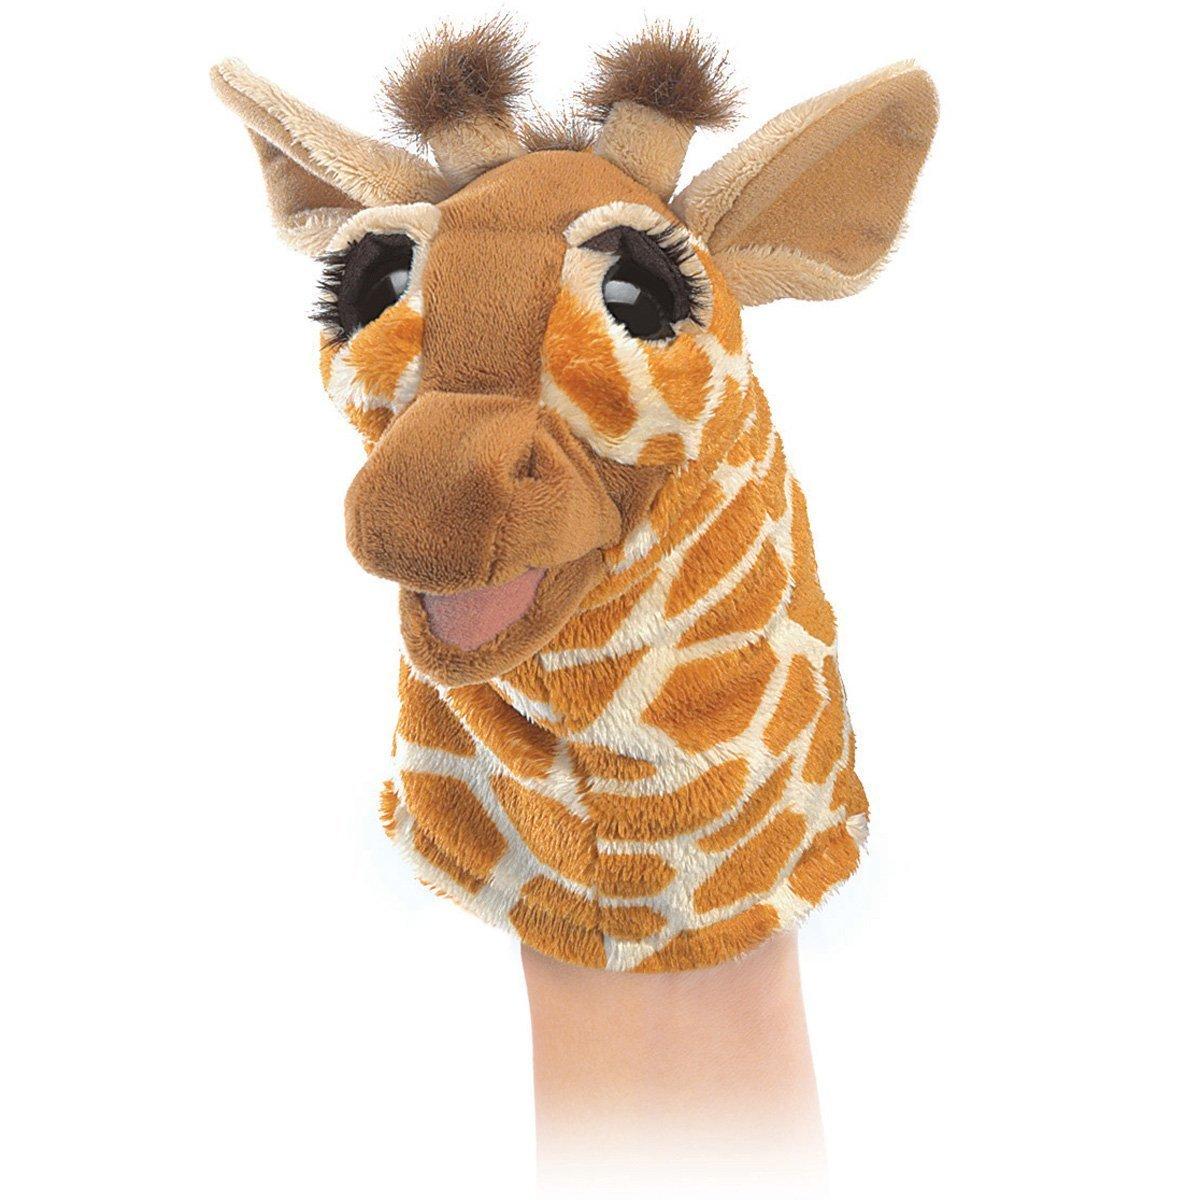 Folkmanis Hand Puppet - Little Giraffe image